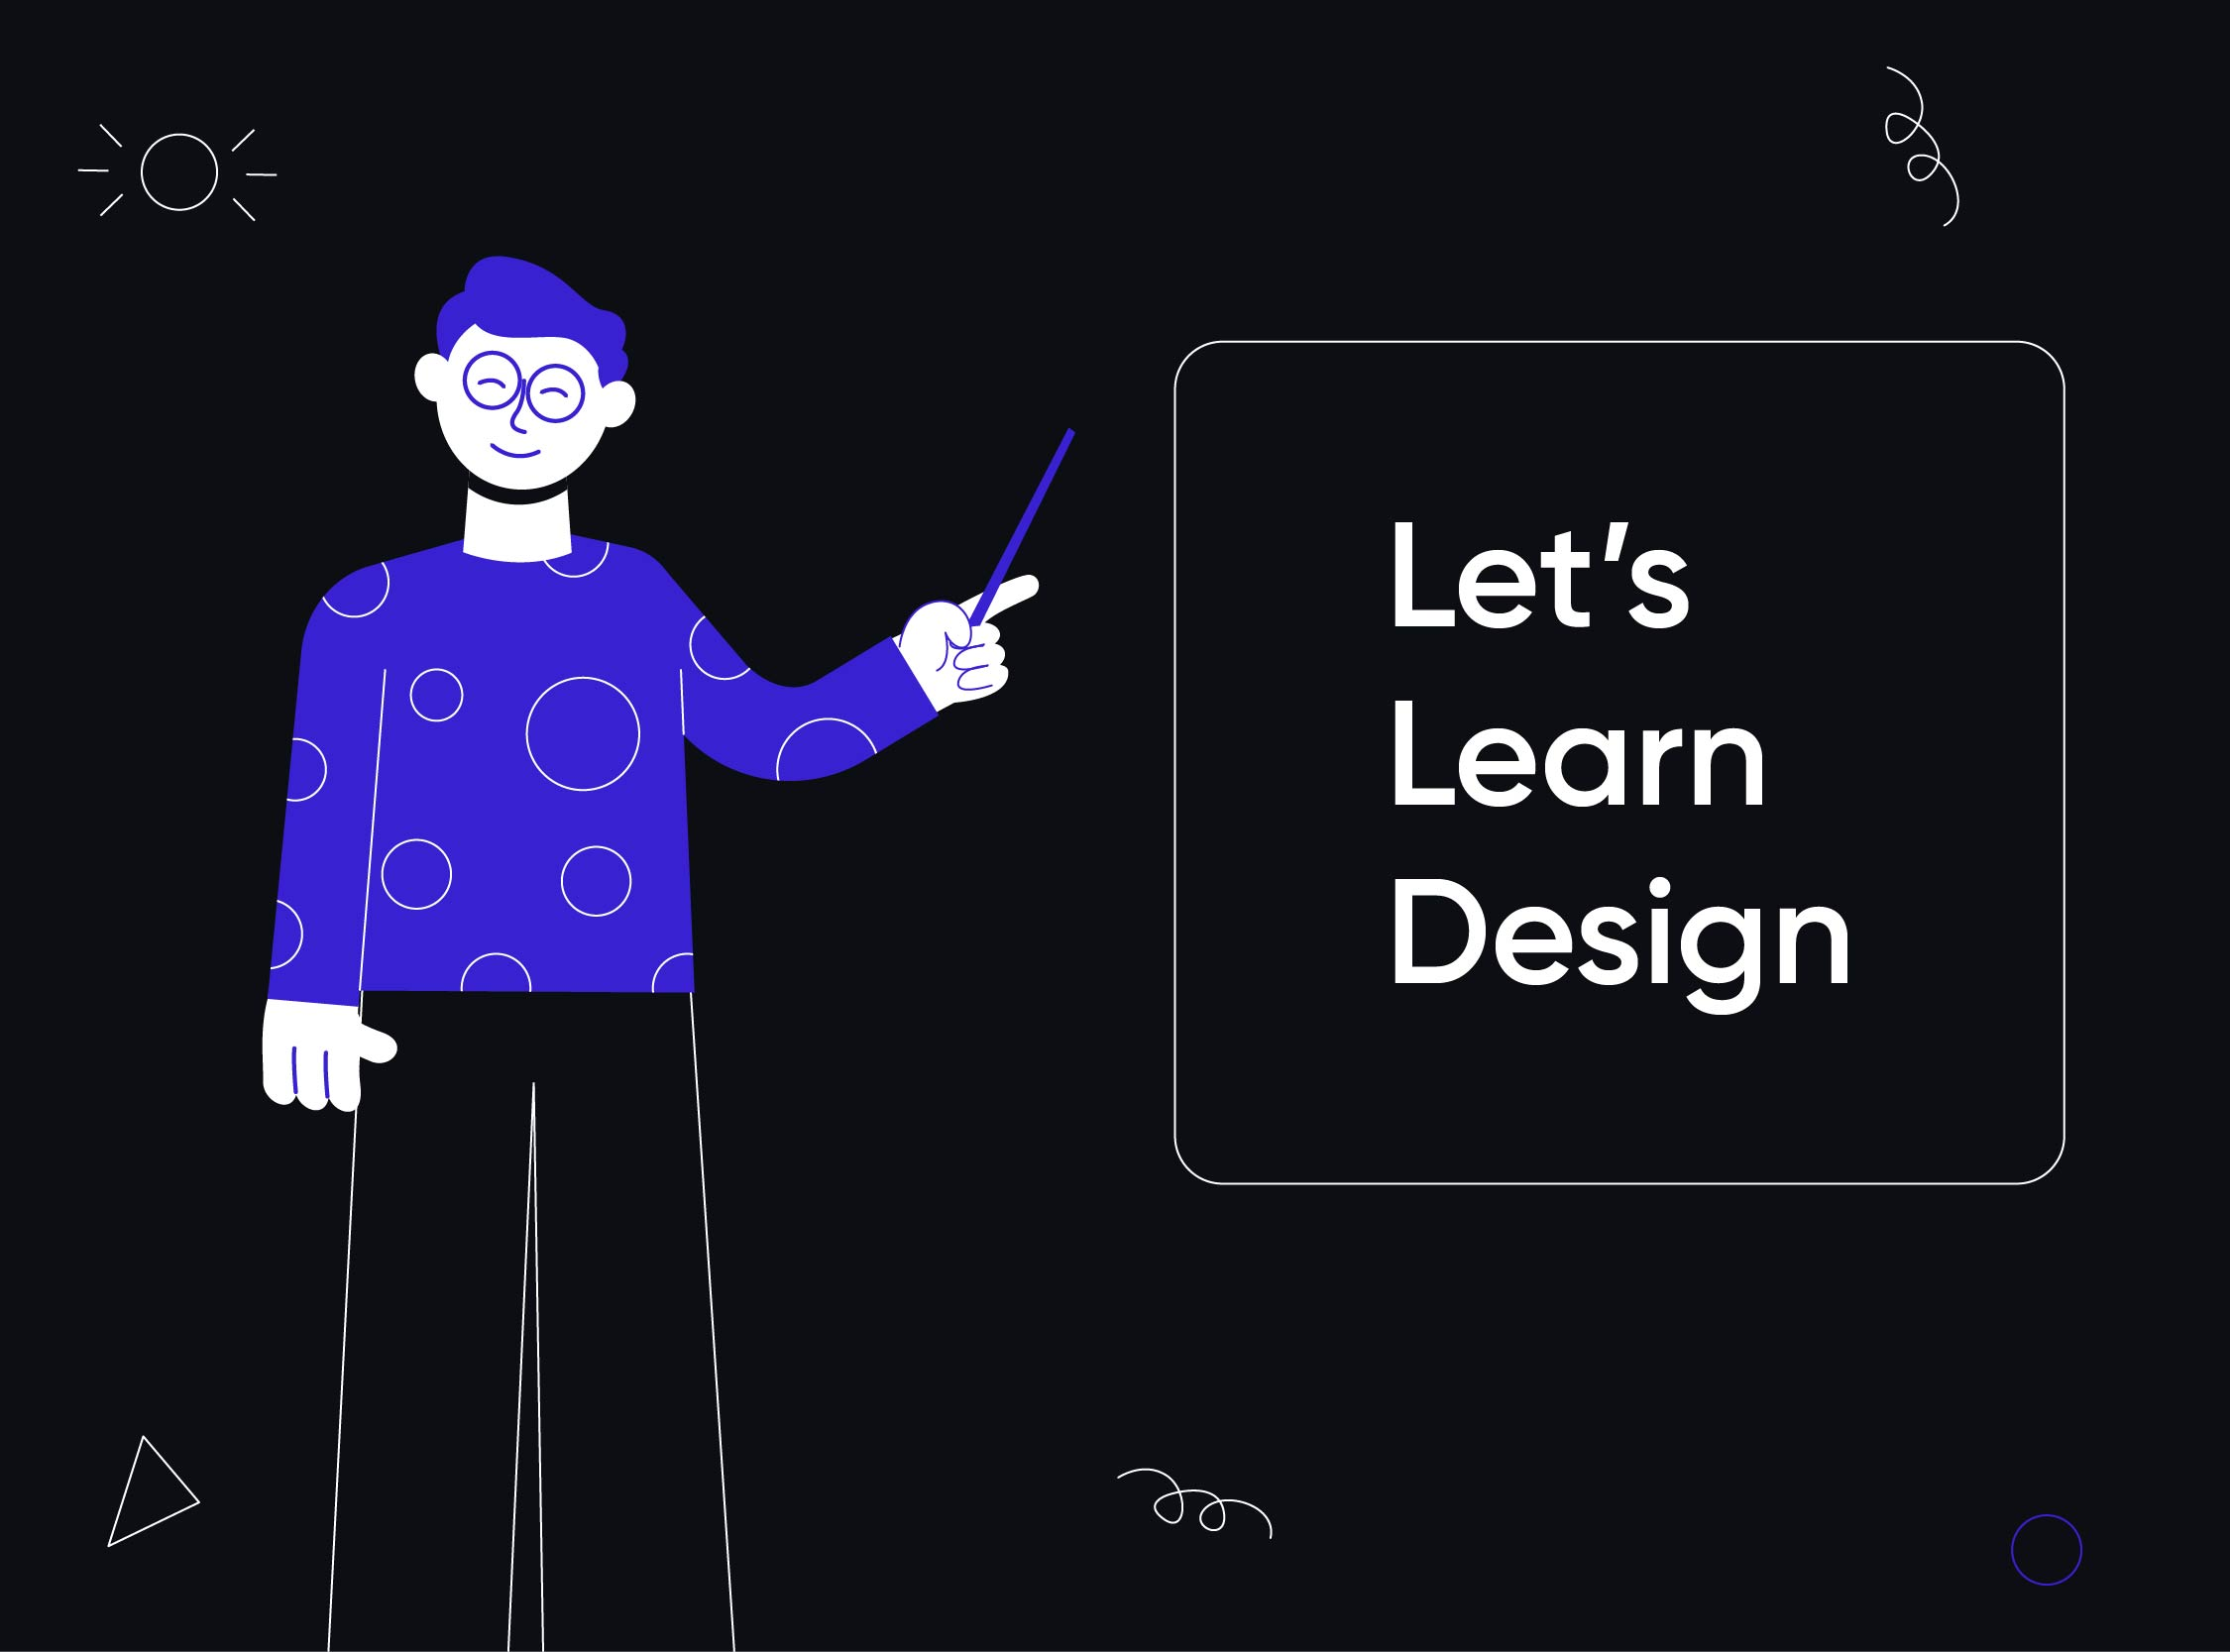 Dear Clients, Let's learn Design.